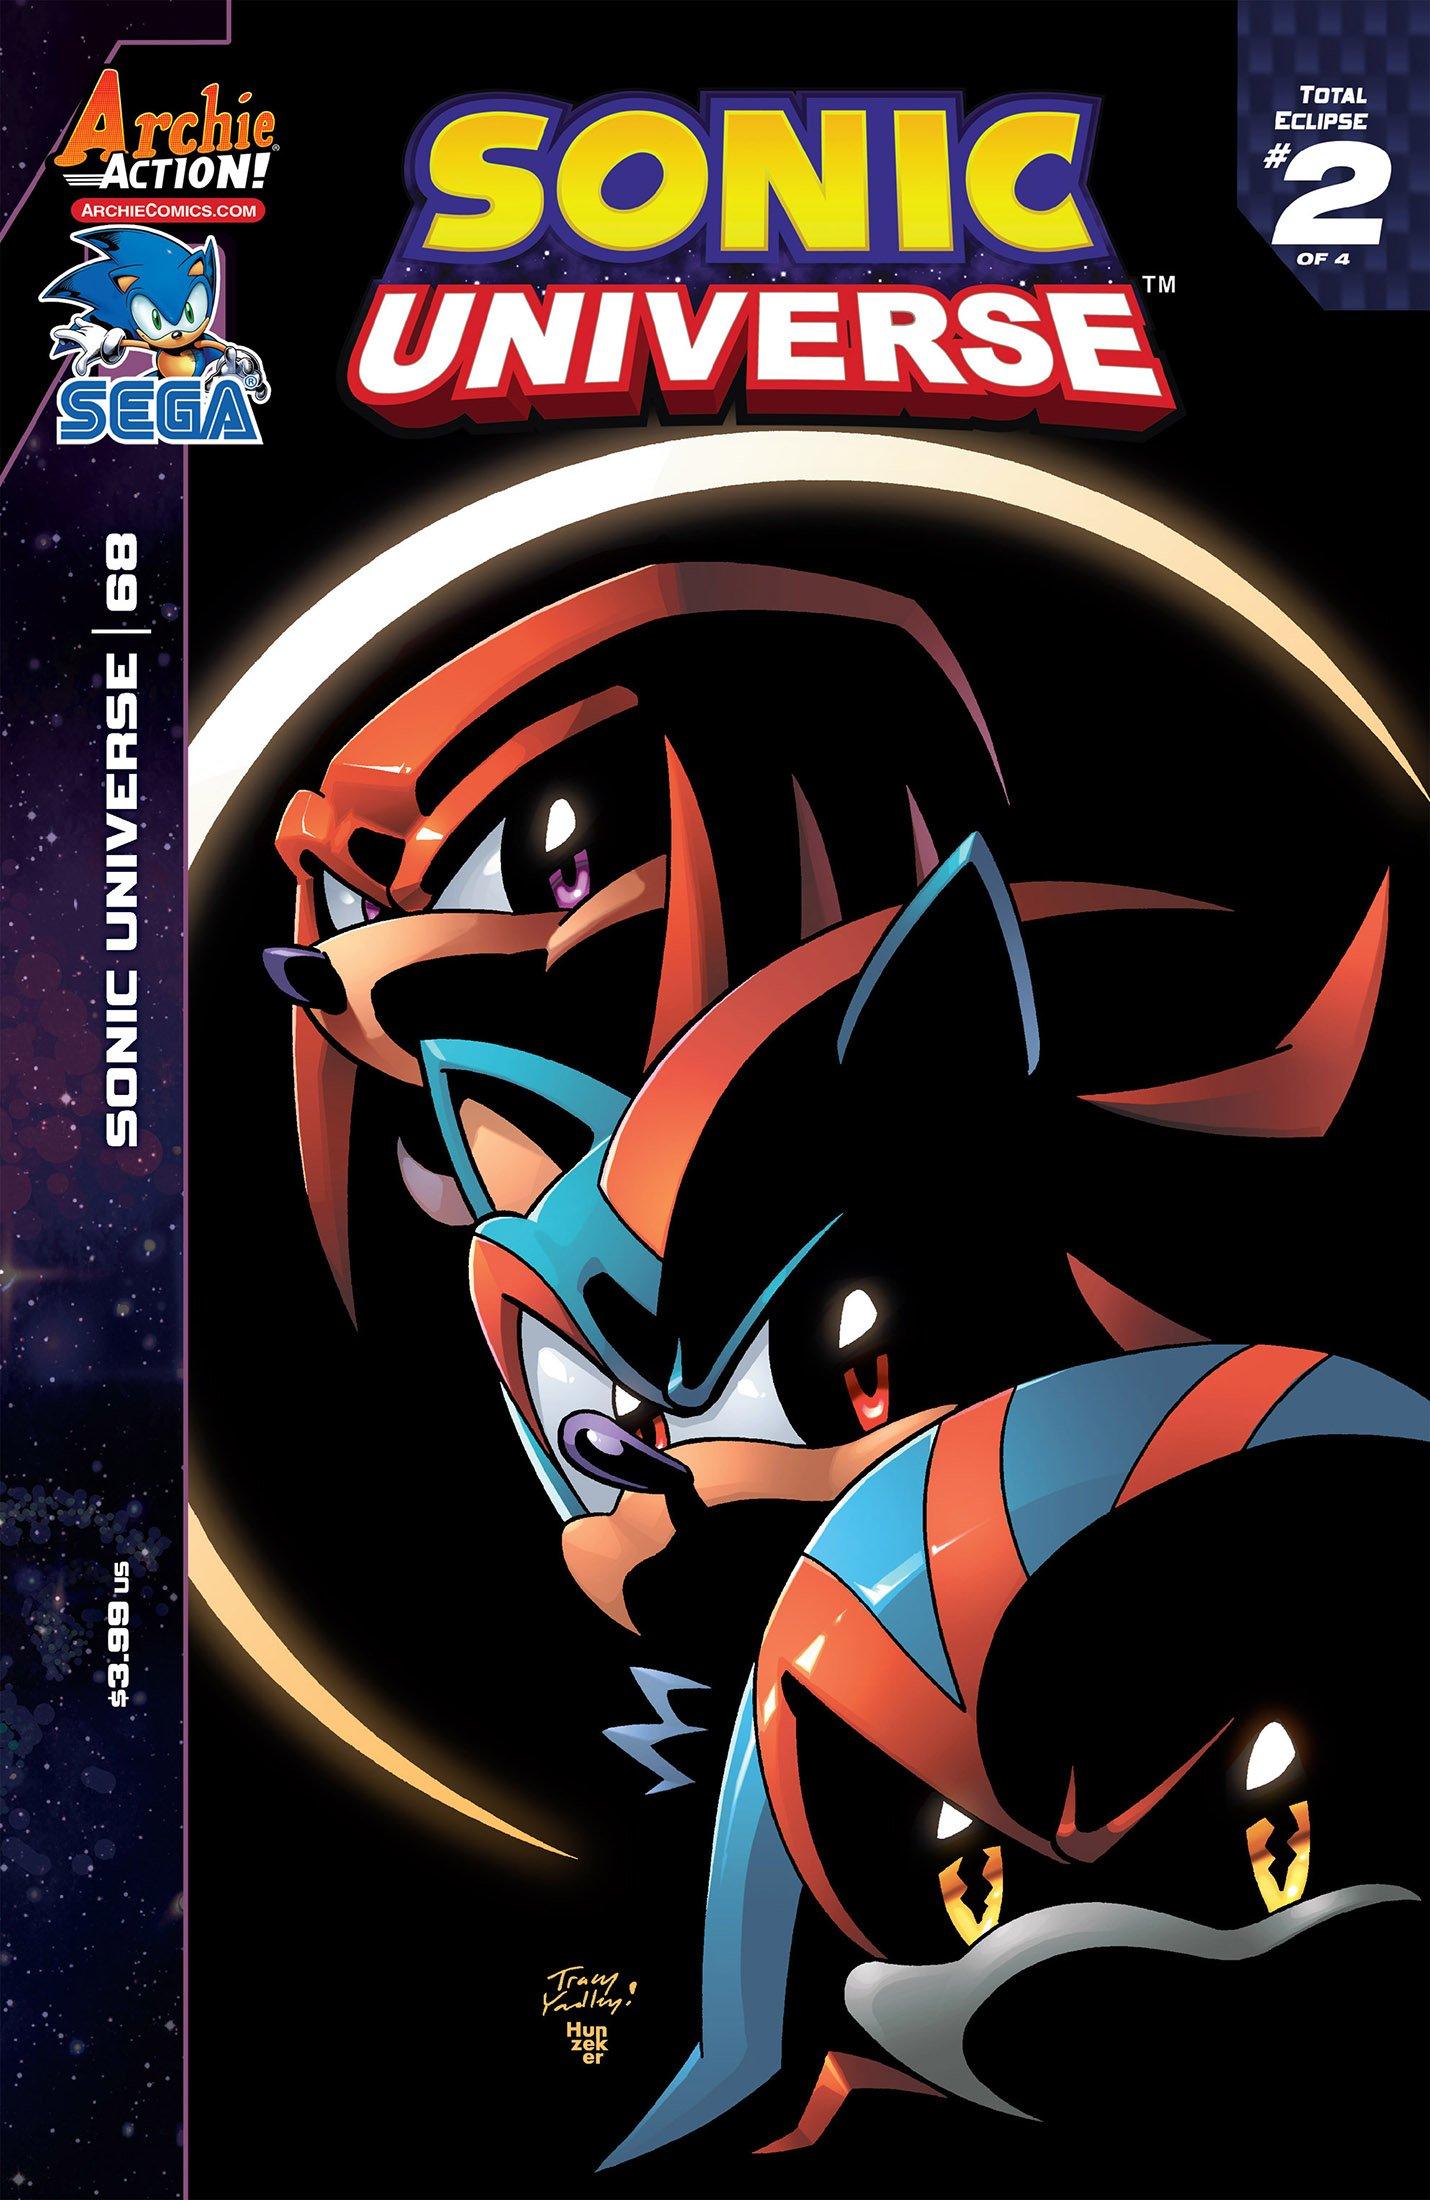 Sonic Universe 068 (November 2014)